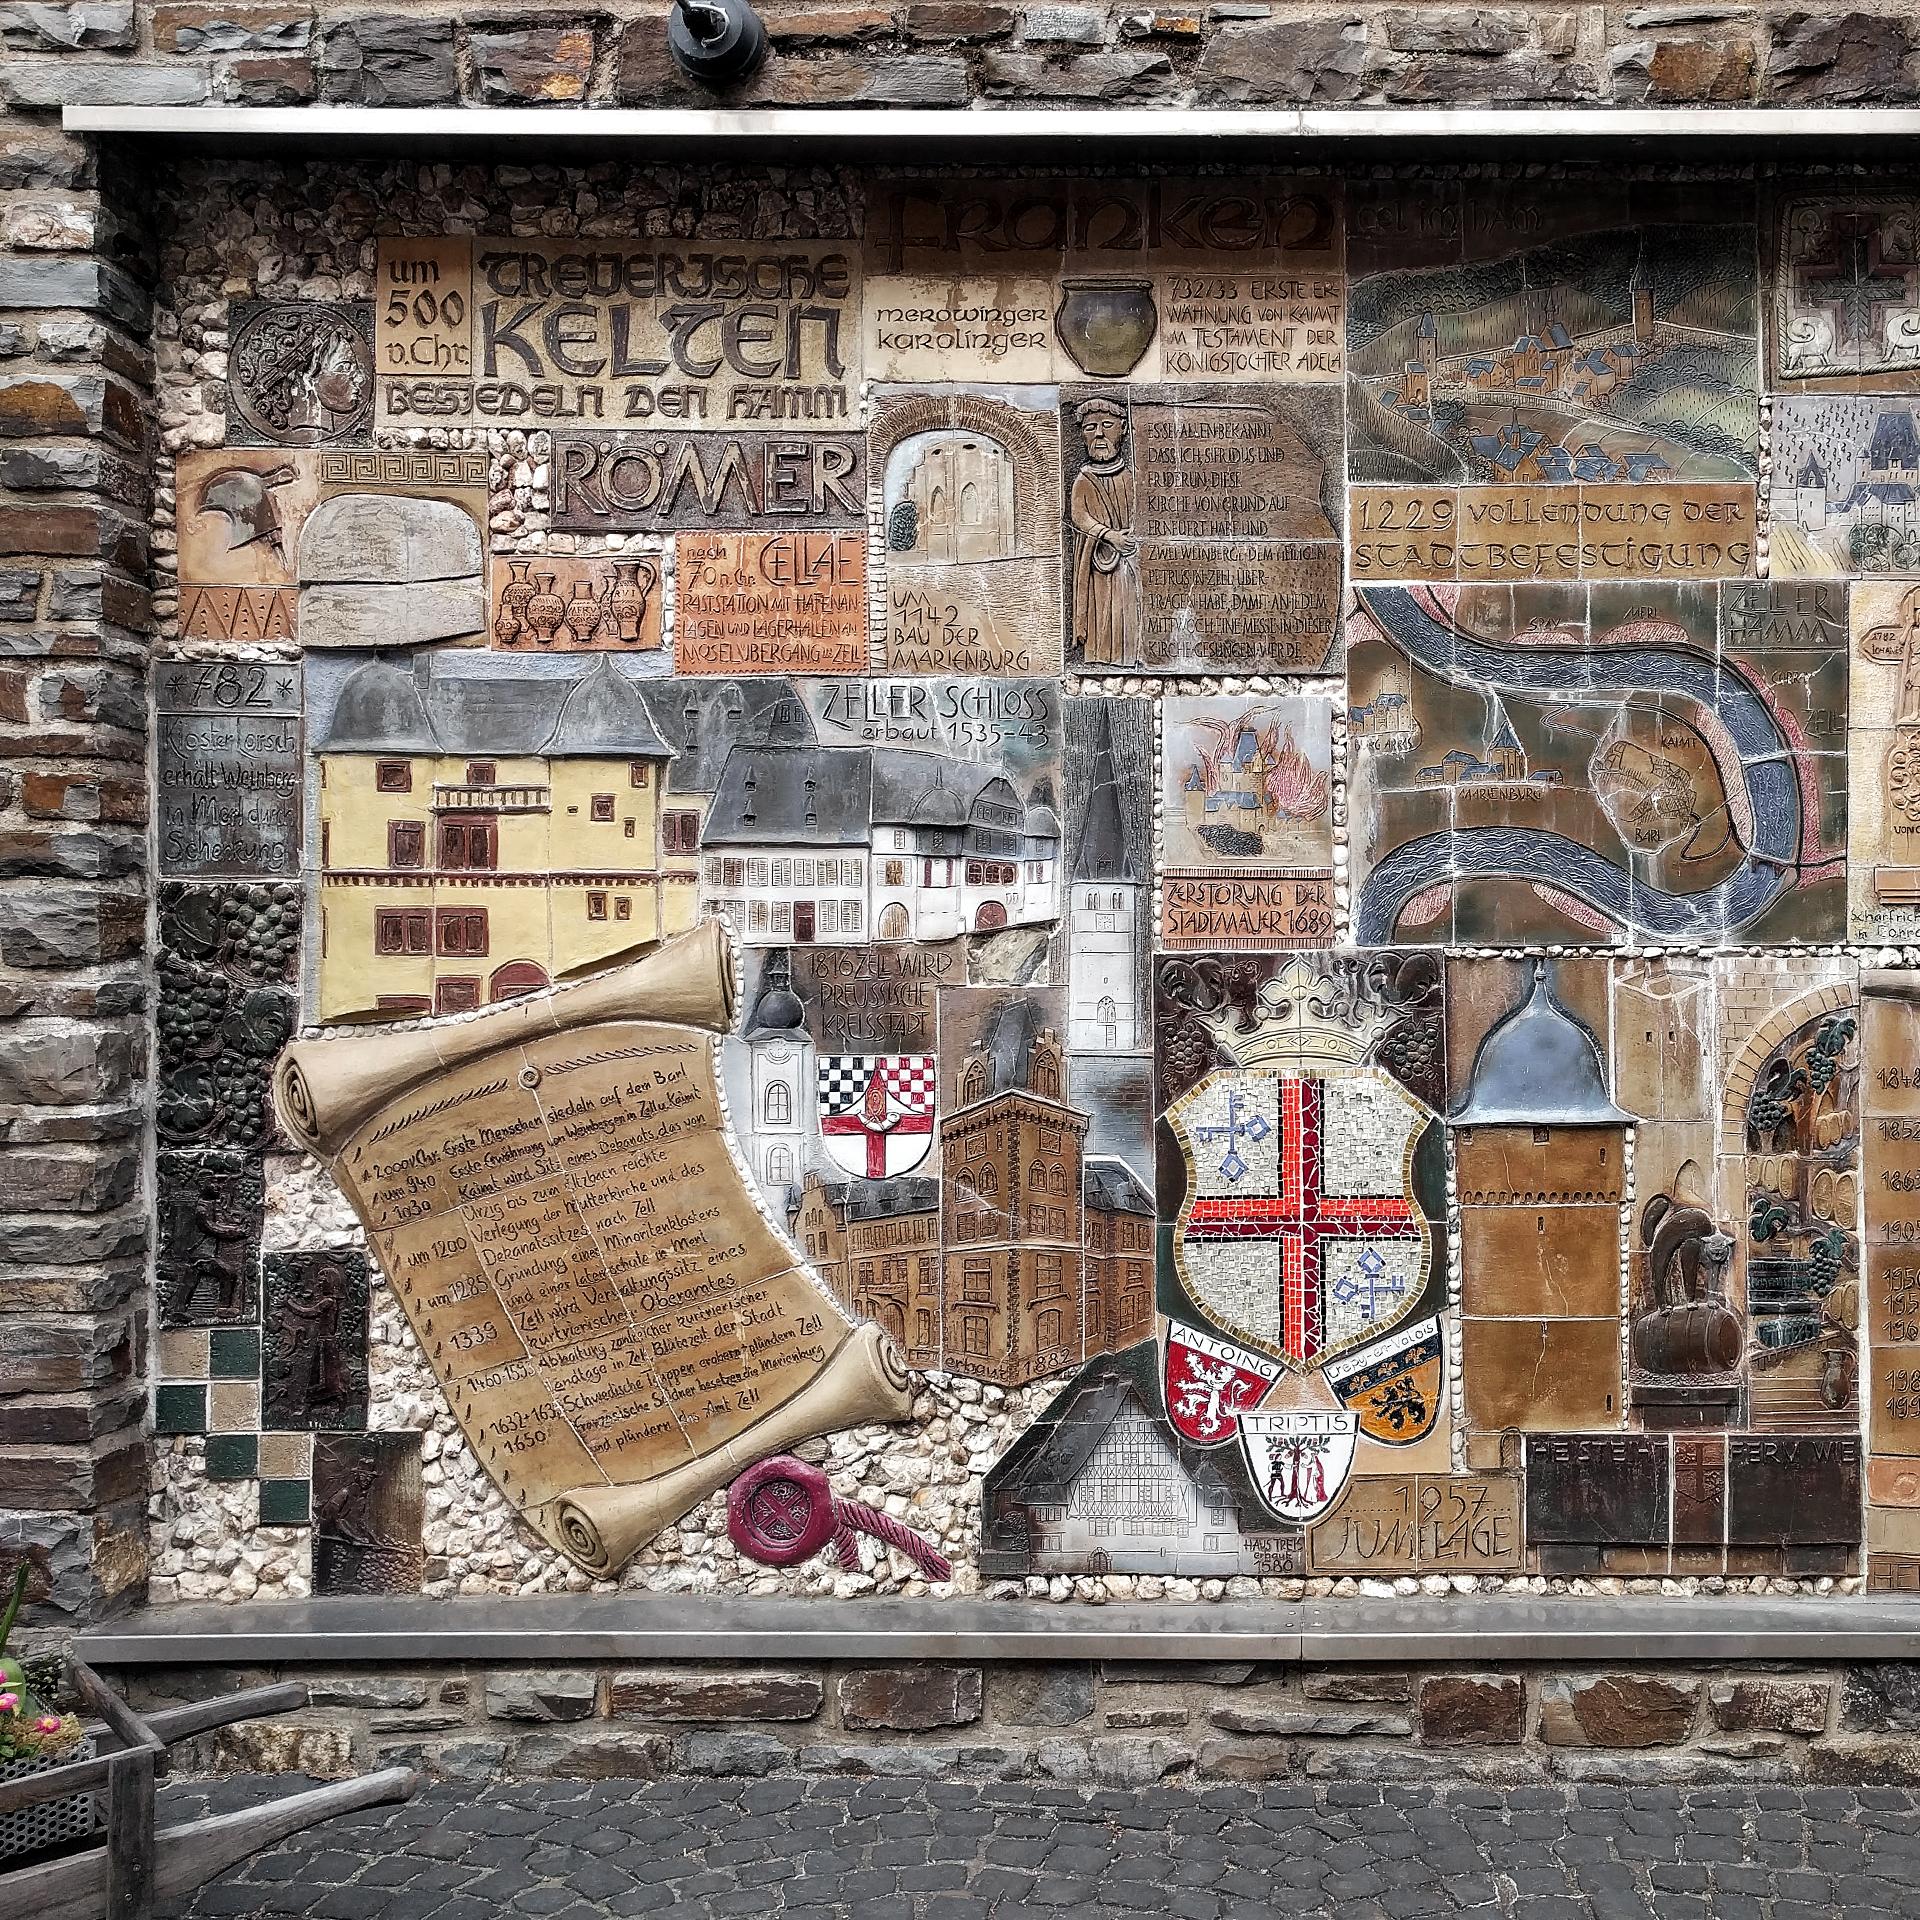 Trier-Koblenz (Duitsland) - geschiedenis als tegelwerk